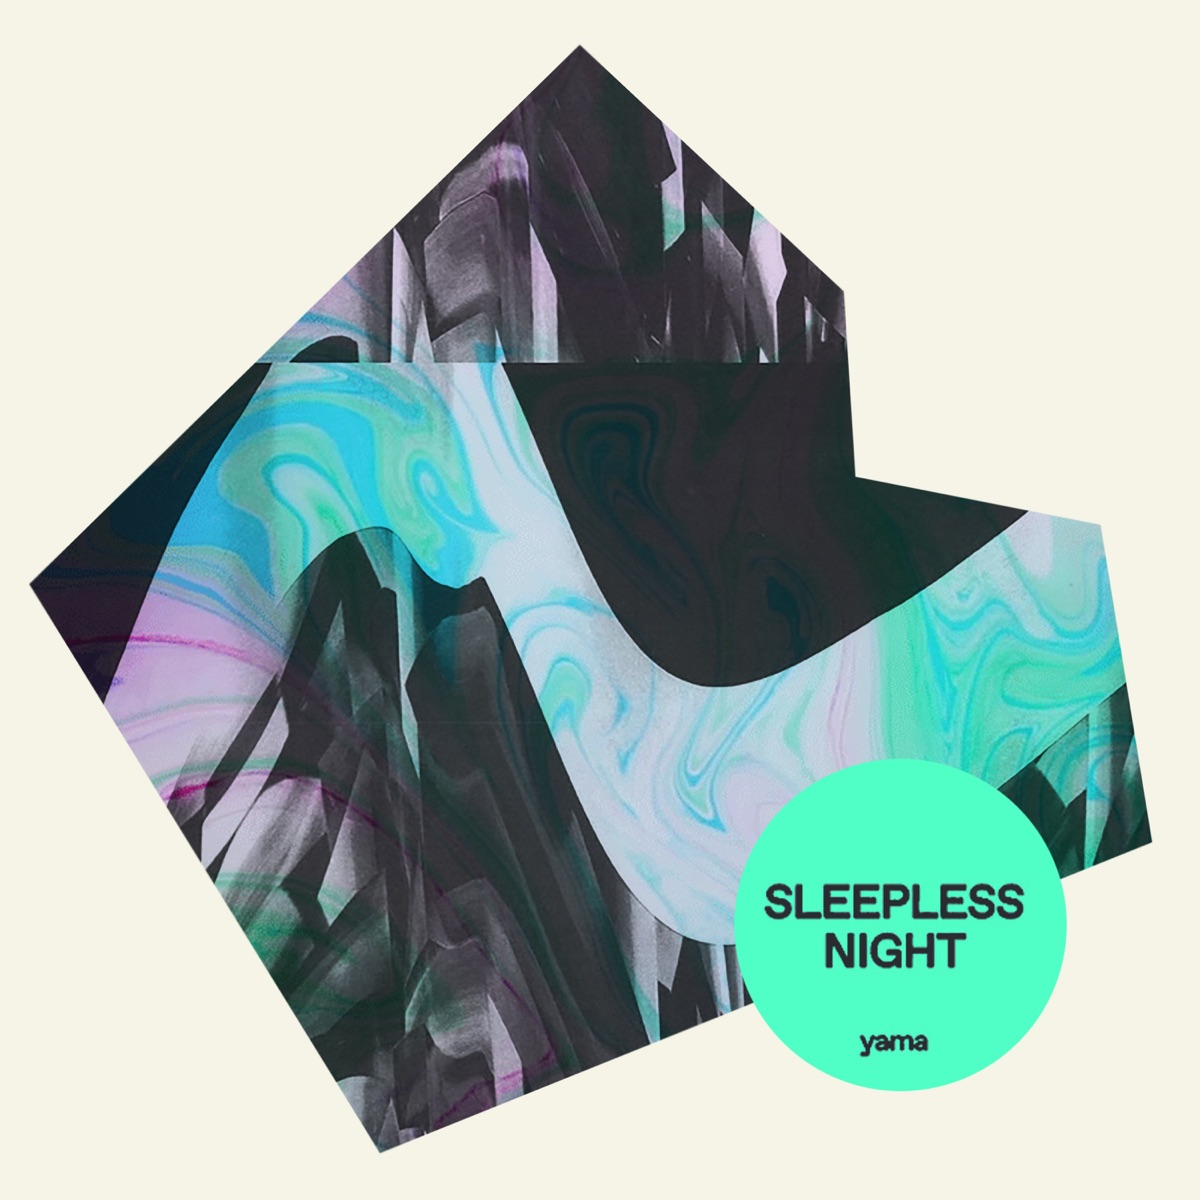 『yama - Sleepless Night』収録の『Sleepless Night』ジャケット